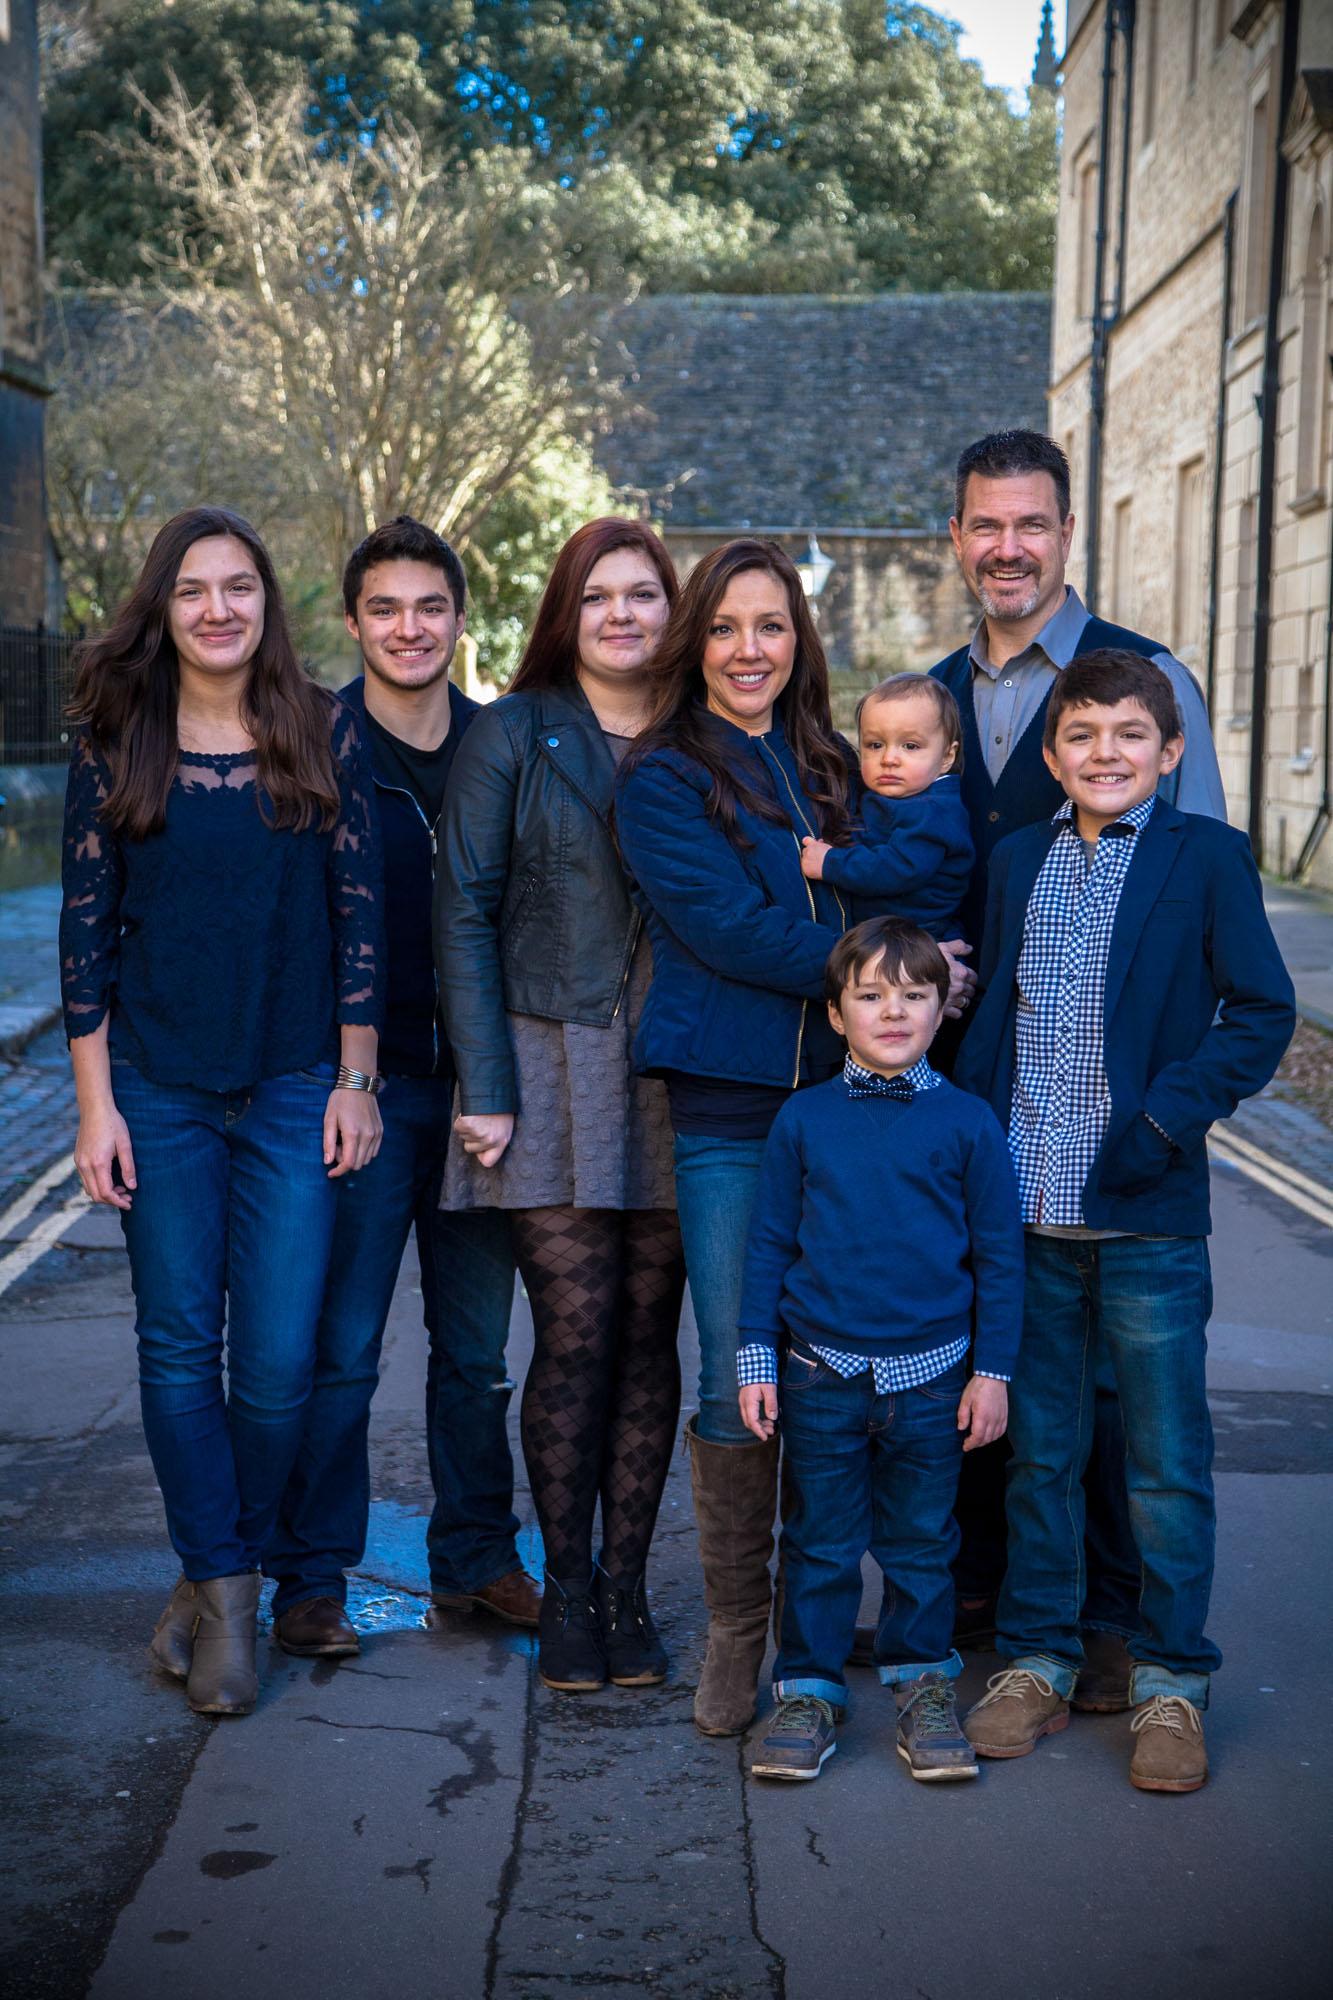 family-life-family-photographer-oxford-london-jonathan-self-photography-31.jpg